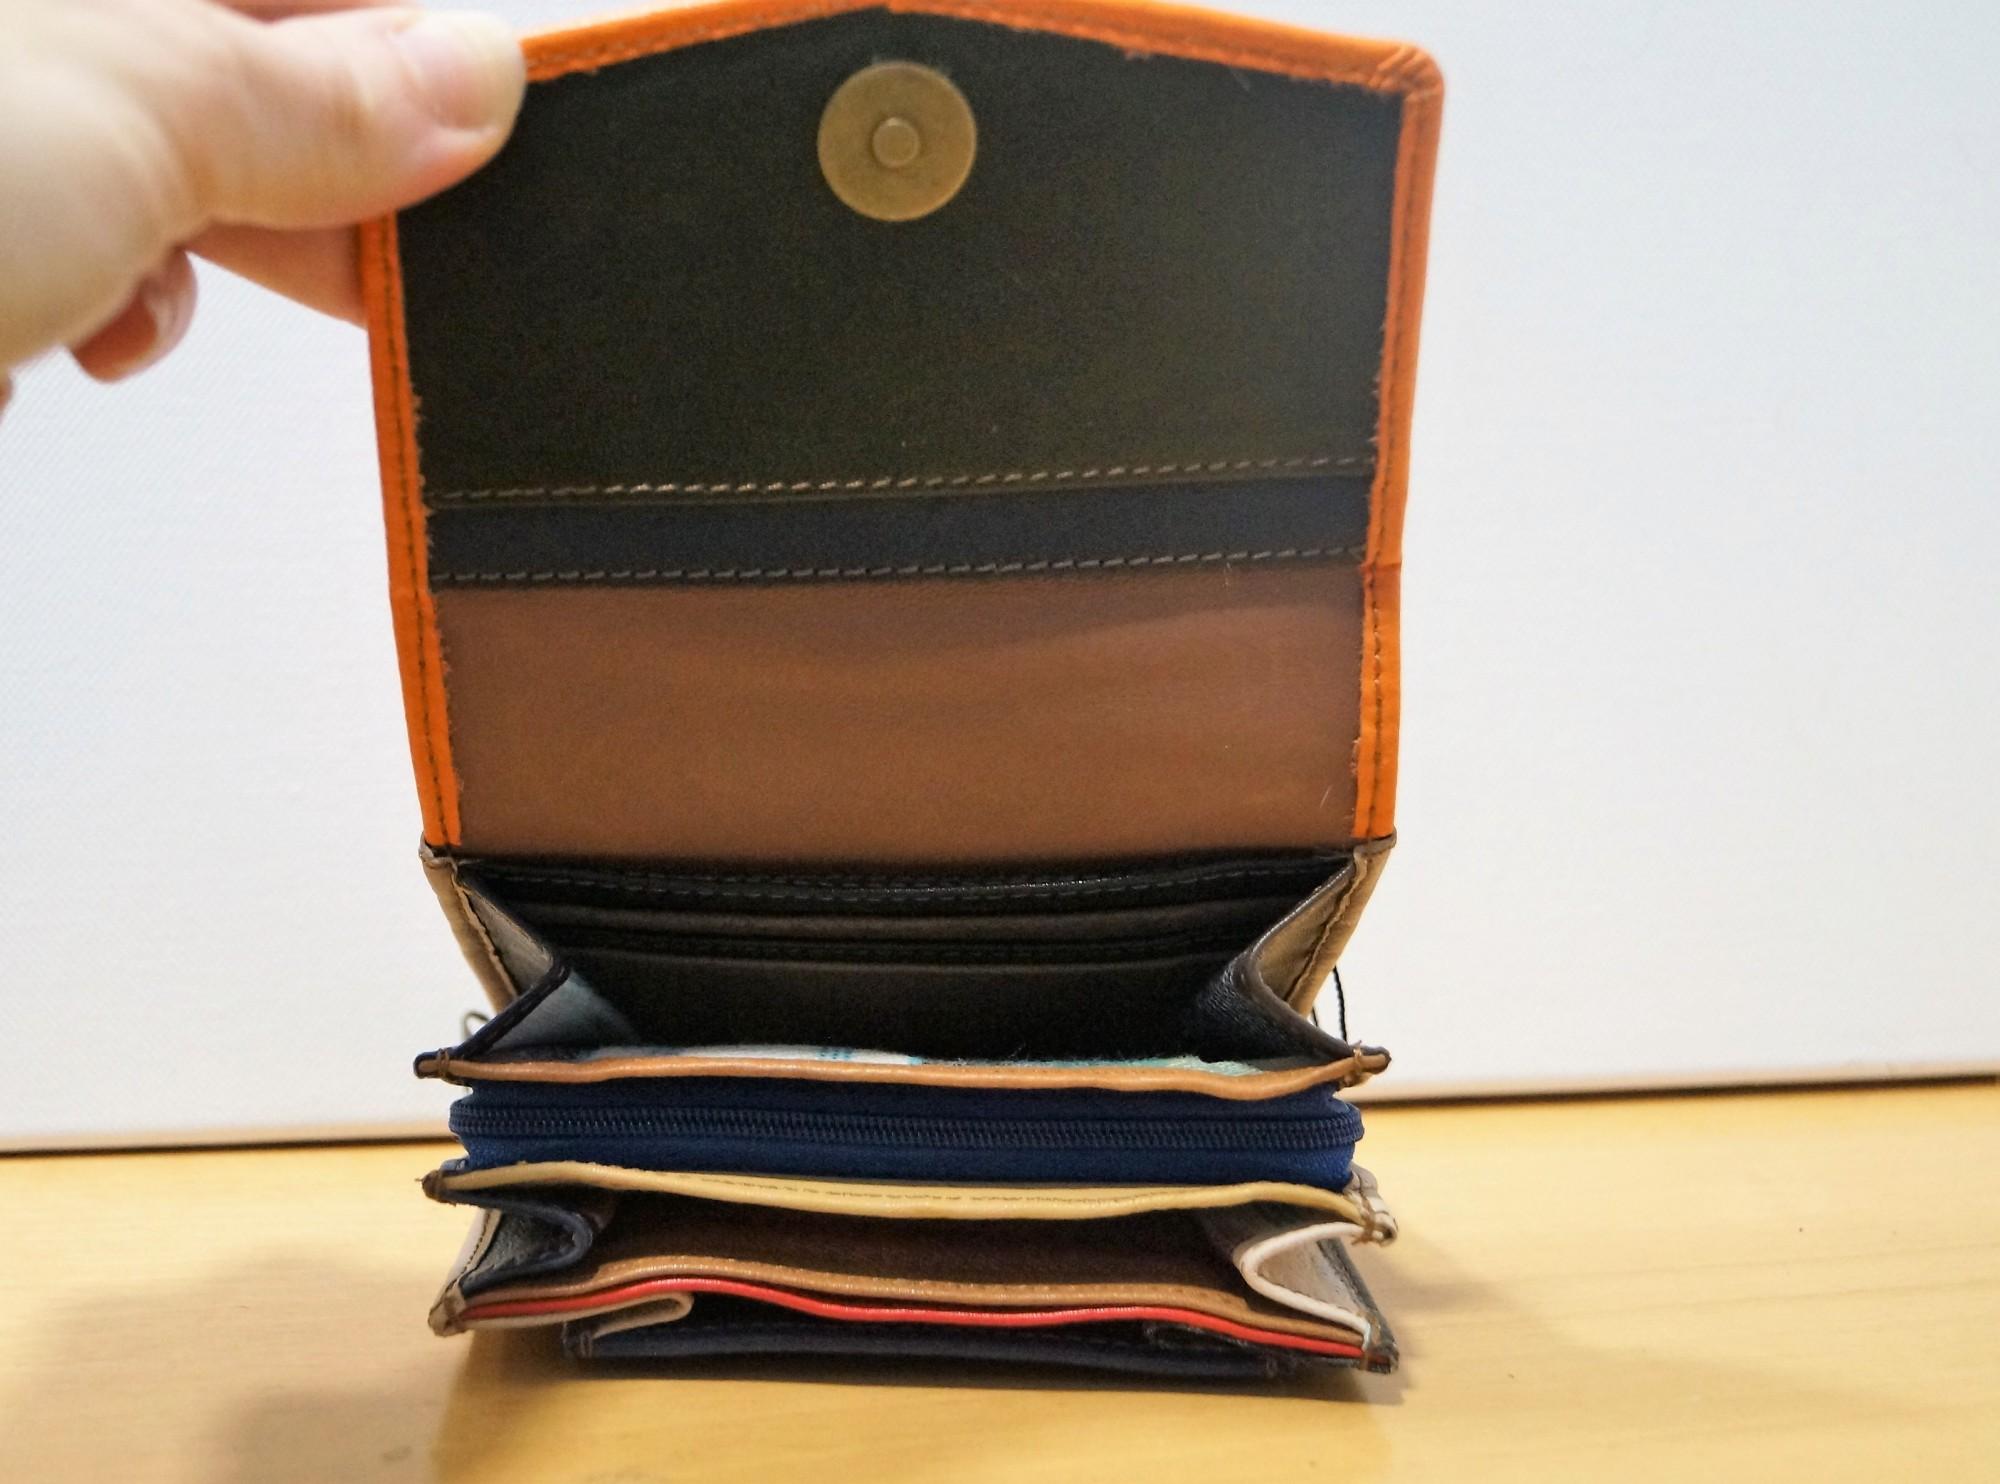 Petit porte monnaie Soruka en cuir recyclé